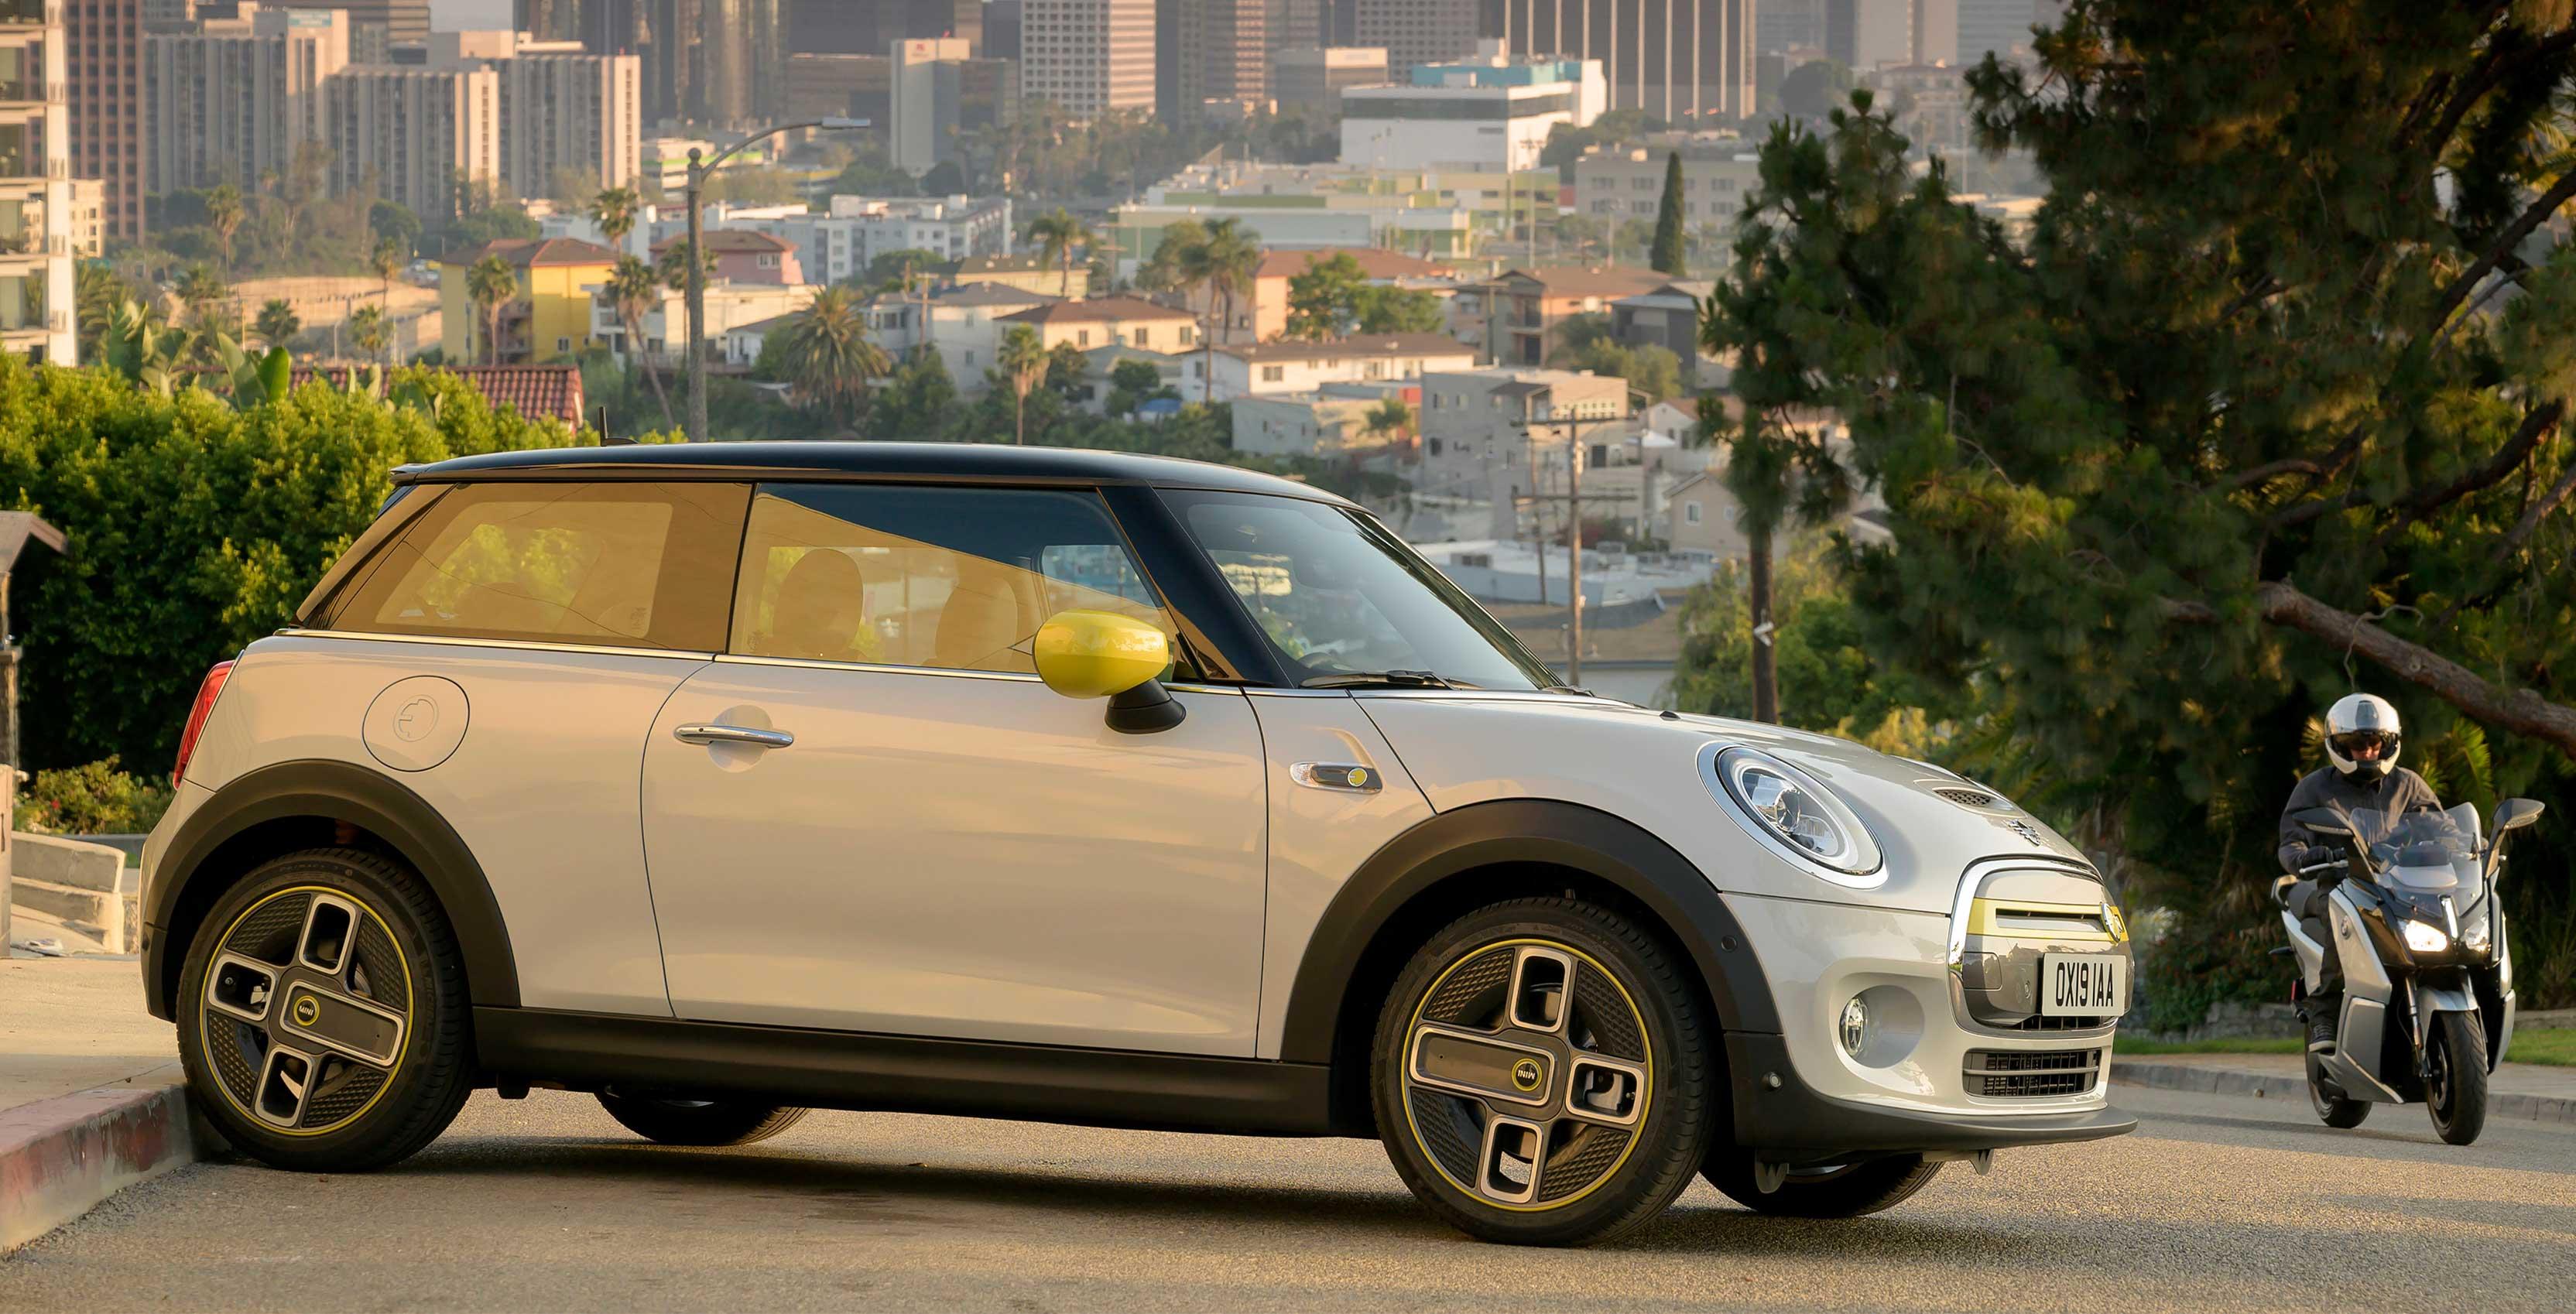 BMW Mini Cooper >> Bmw Group Unveils Fully Electric Mini Cooper Se